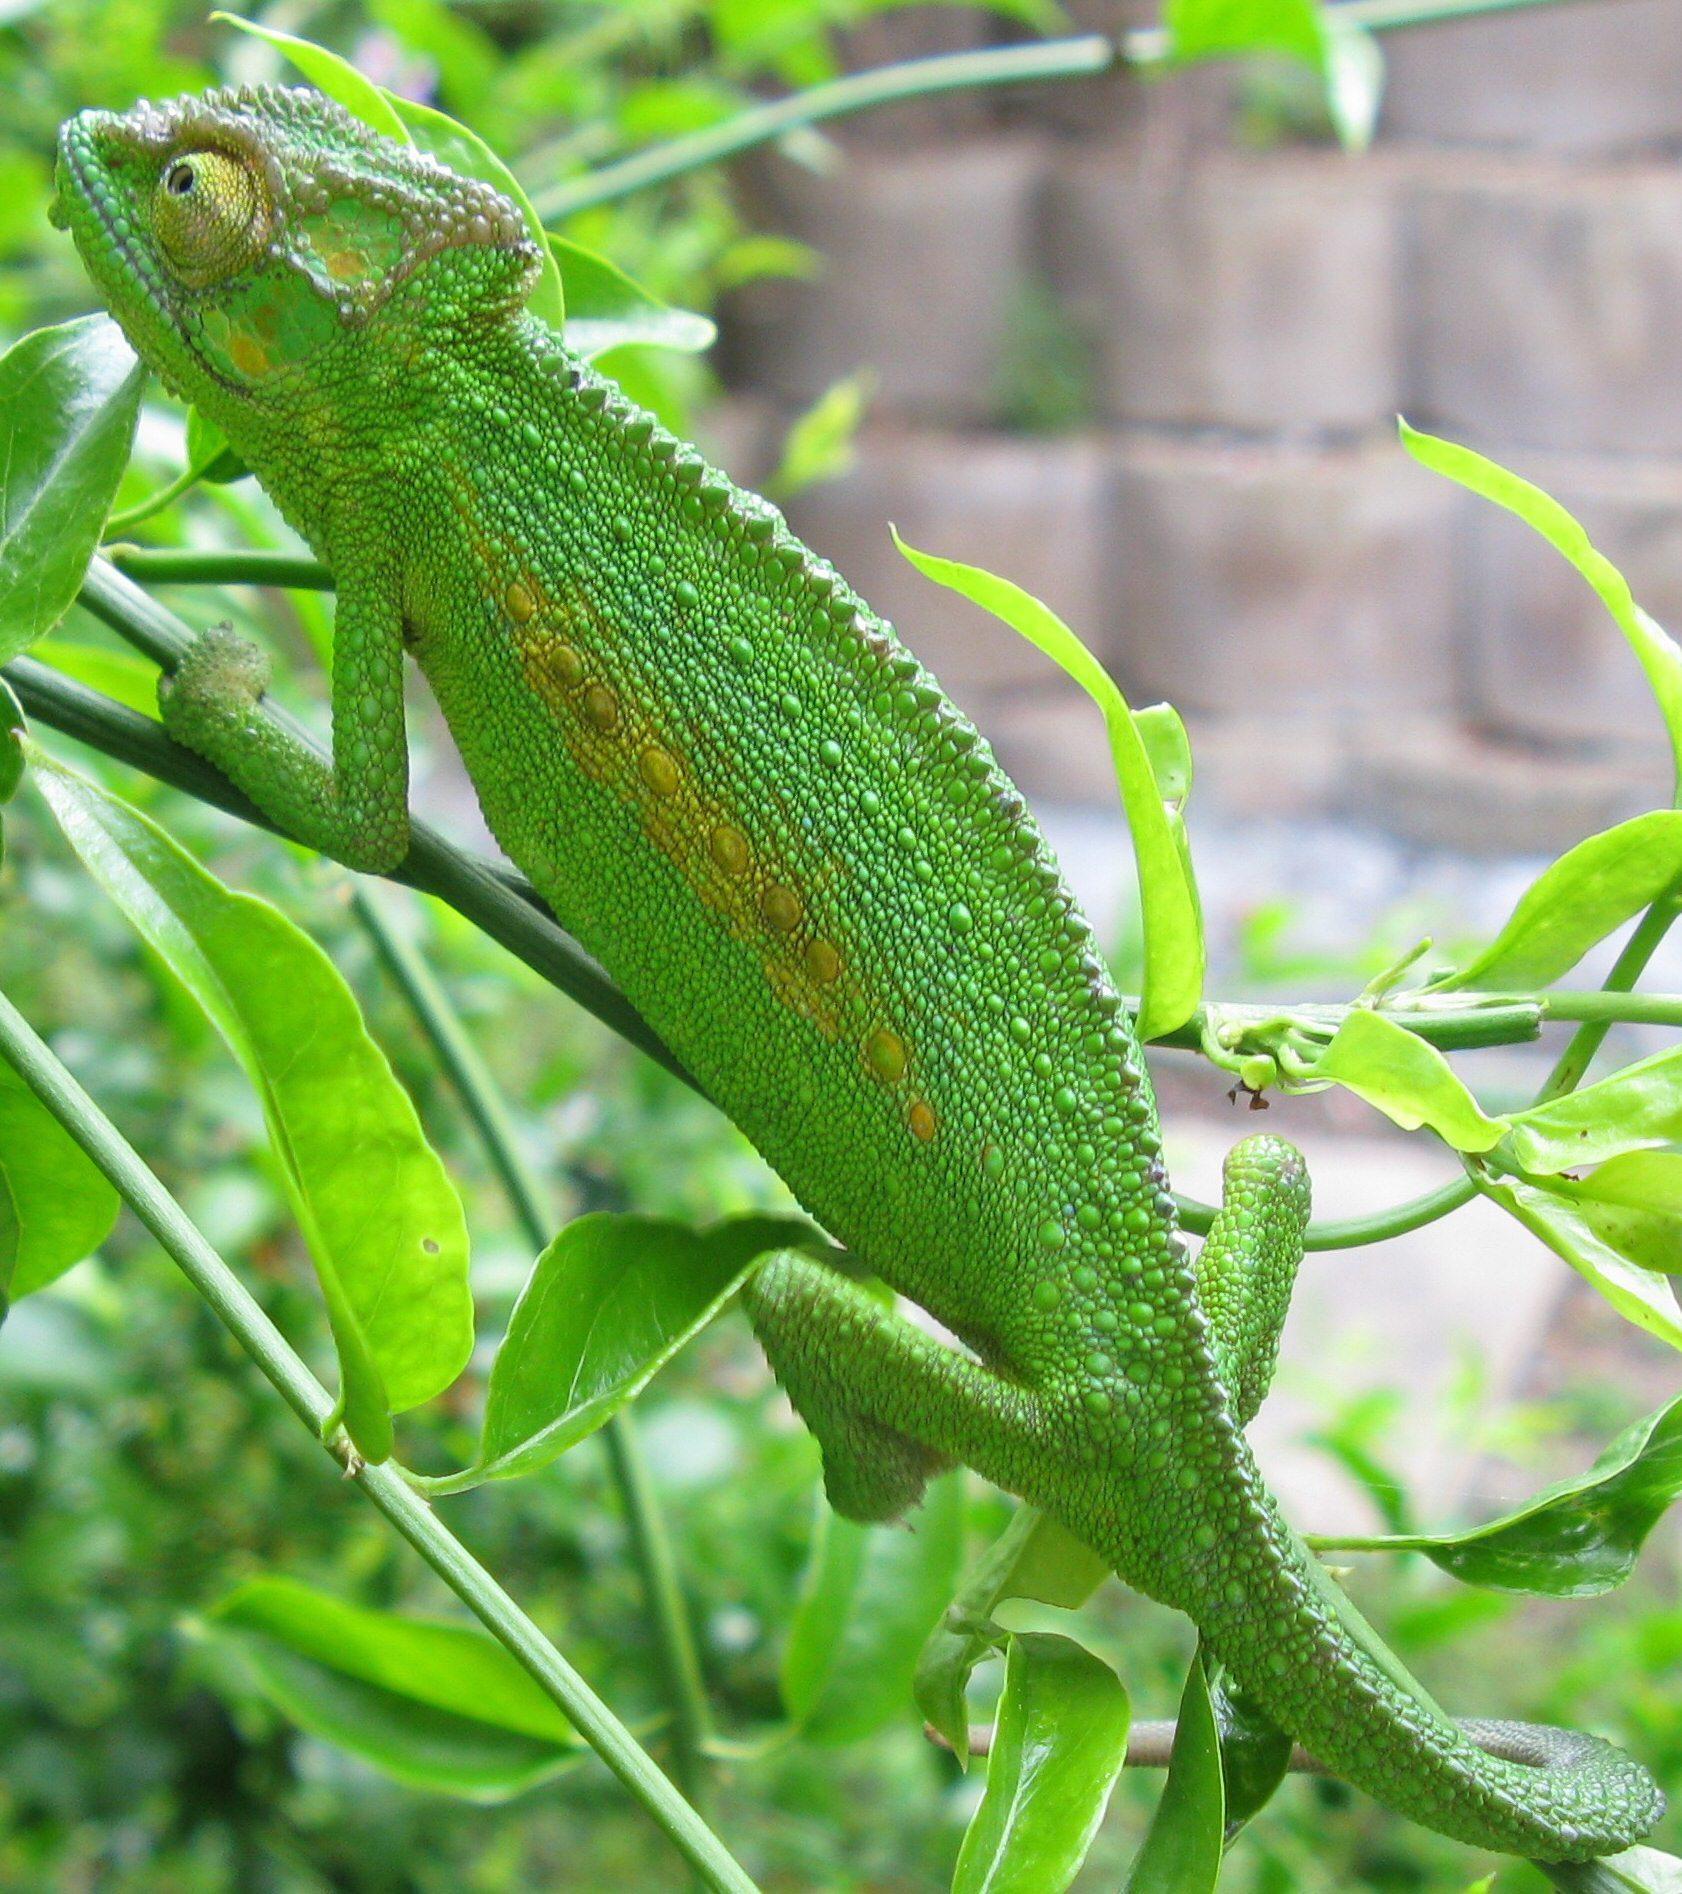 bradypodion_pumilum_cape_chameleon_female_img_1767_cropped